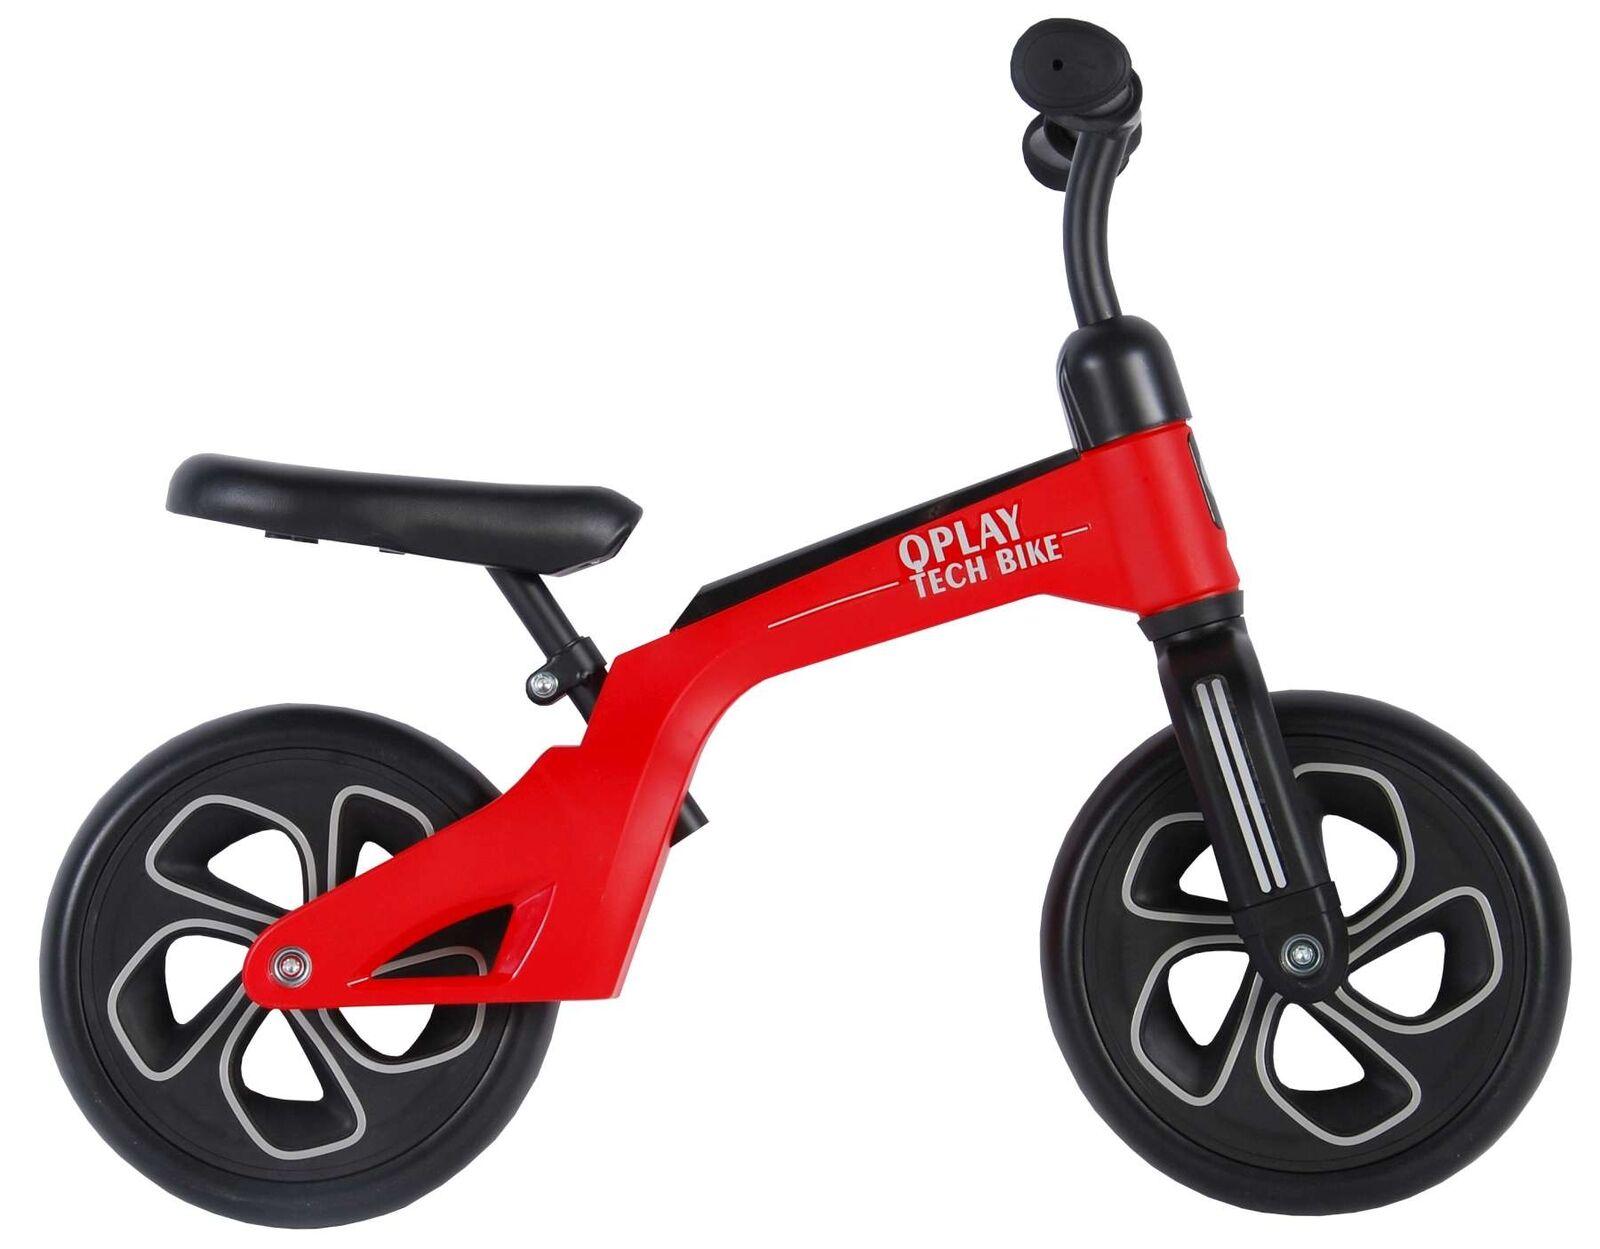 Kinder Laufrad QPlay Tech Bike 10 Zoll rot Sattel Lenker höhenverstellbar